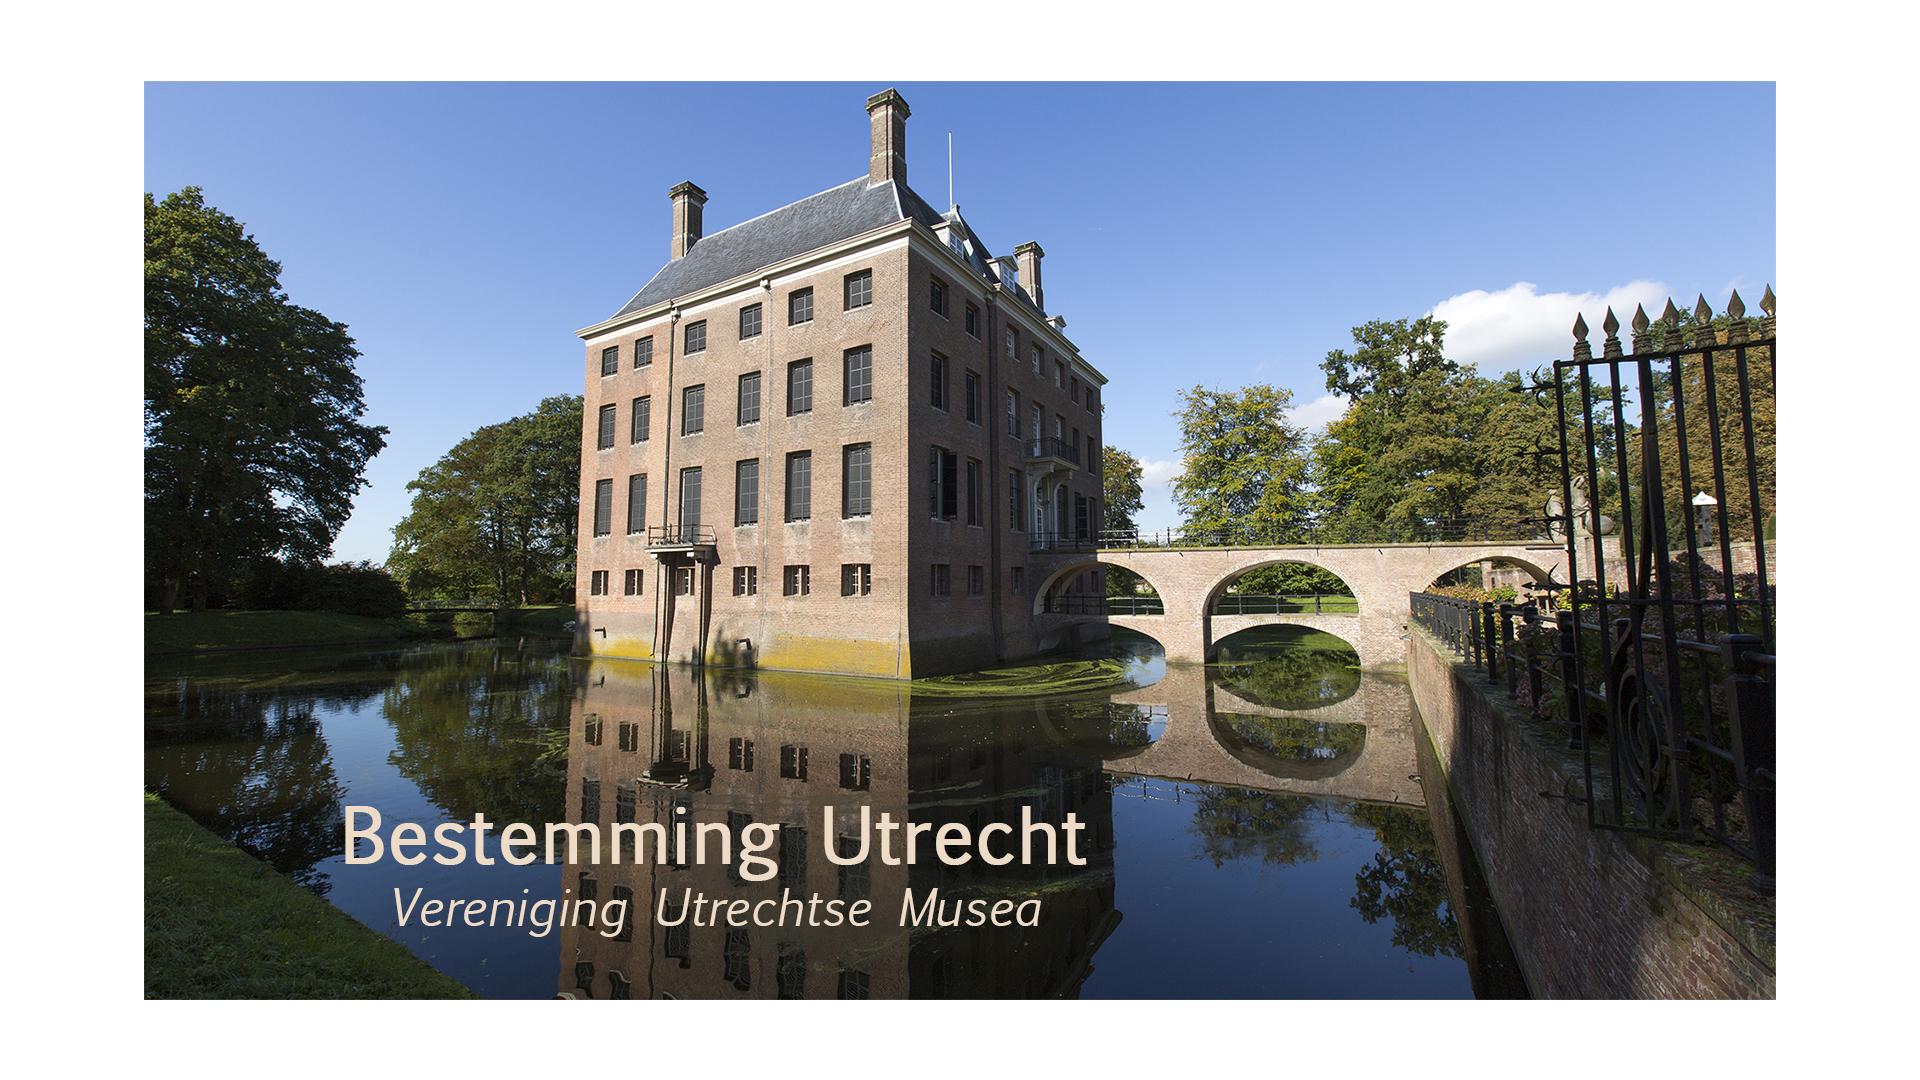 Bestemming-Utrecht-1920x1080